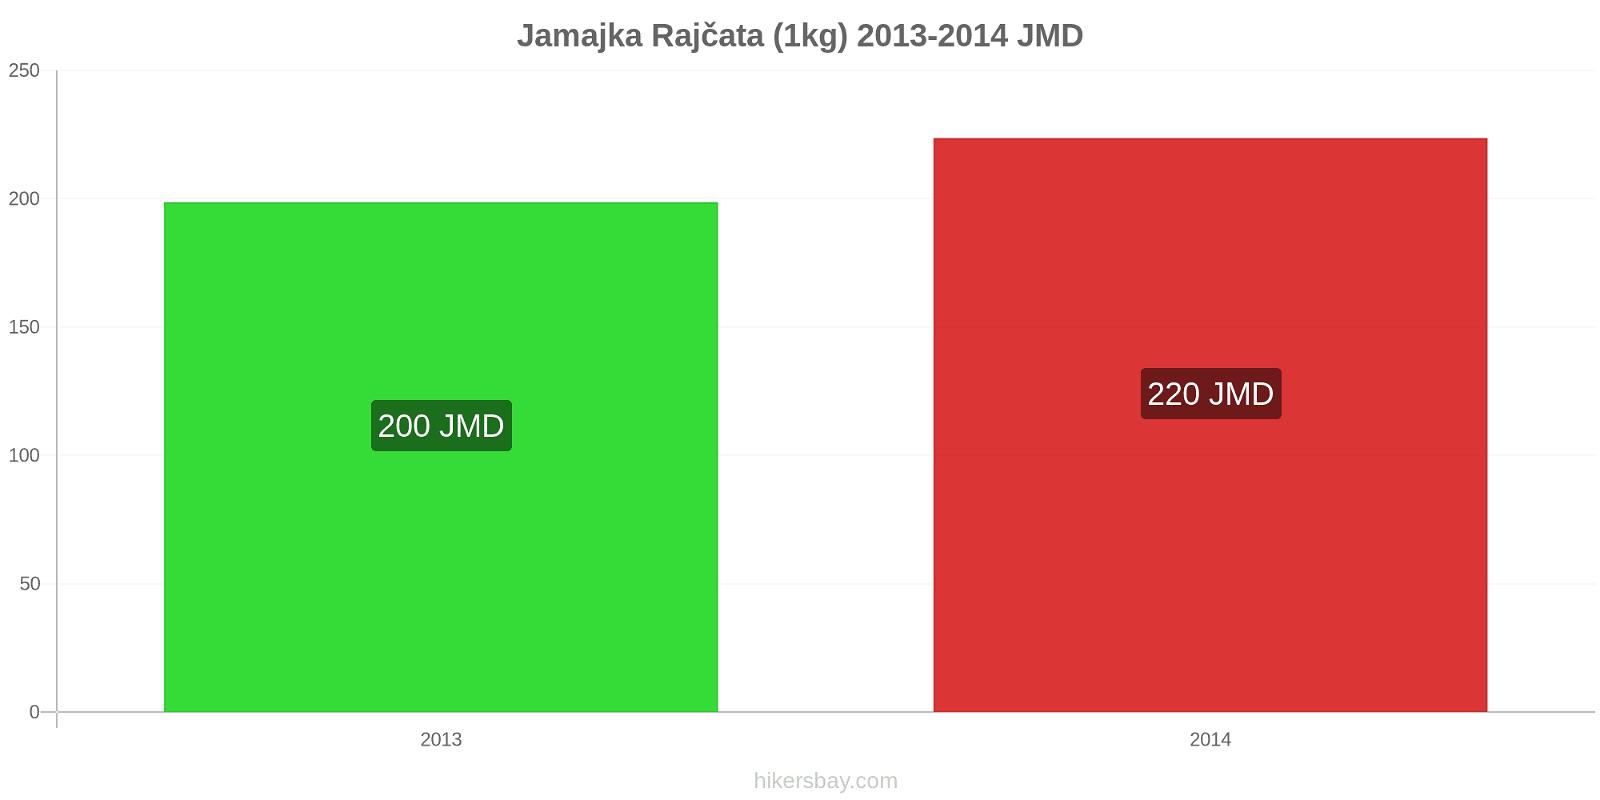 Jamajka změny cen Rajčata (1kg) hikersbay.com